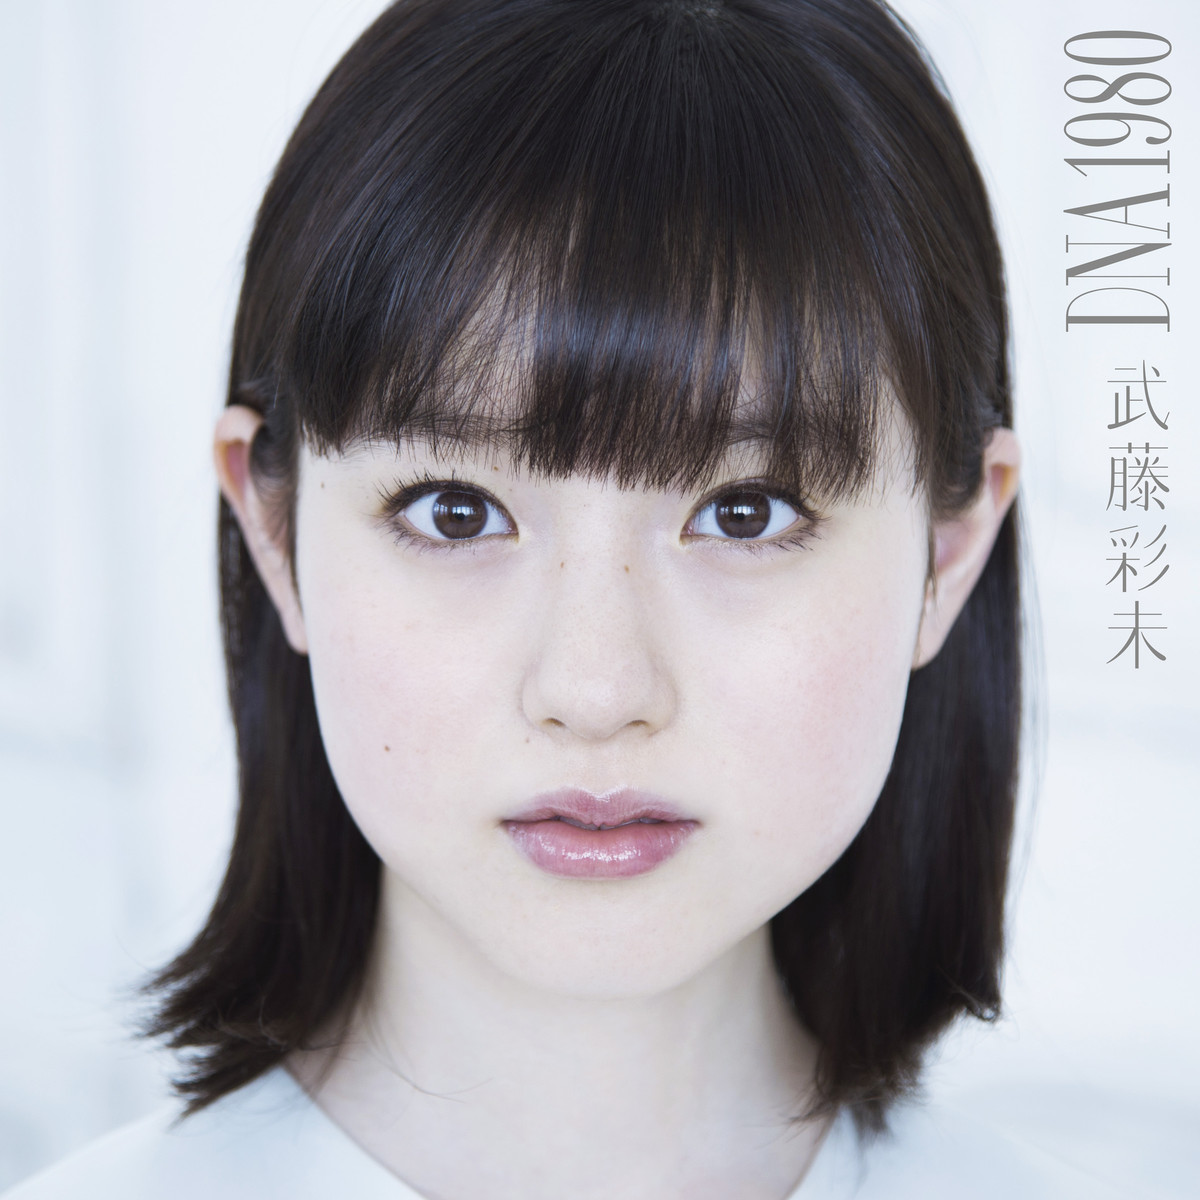 20180122.0547.09 Ayami Muto - DNA1980 Vol.1 cover.jpg